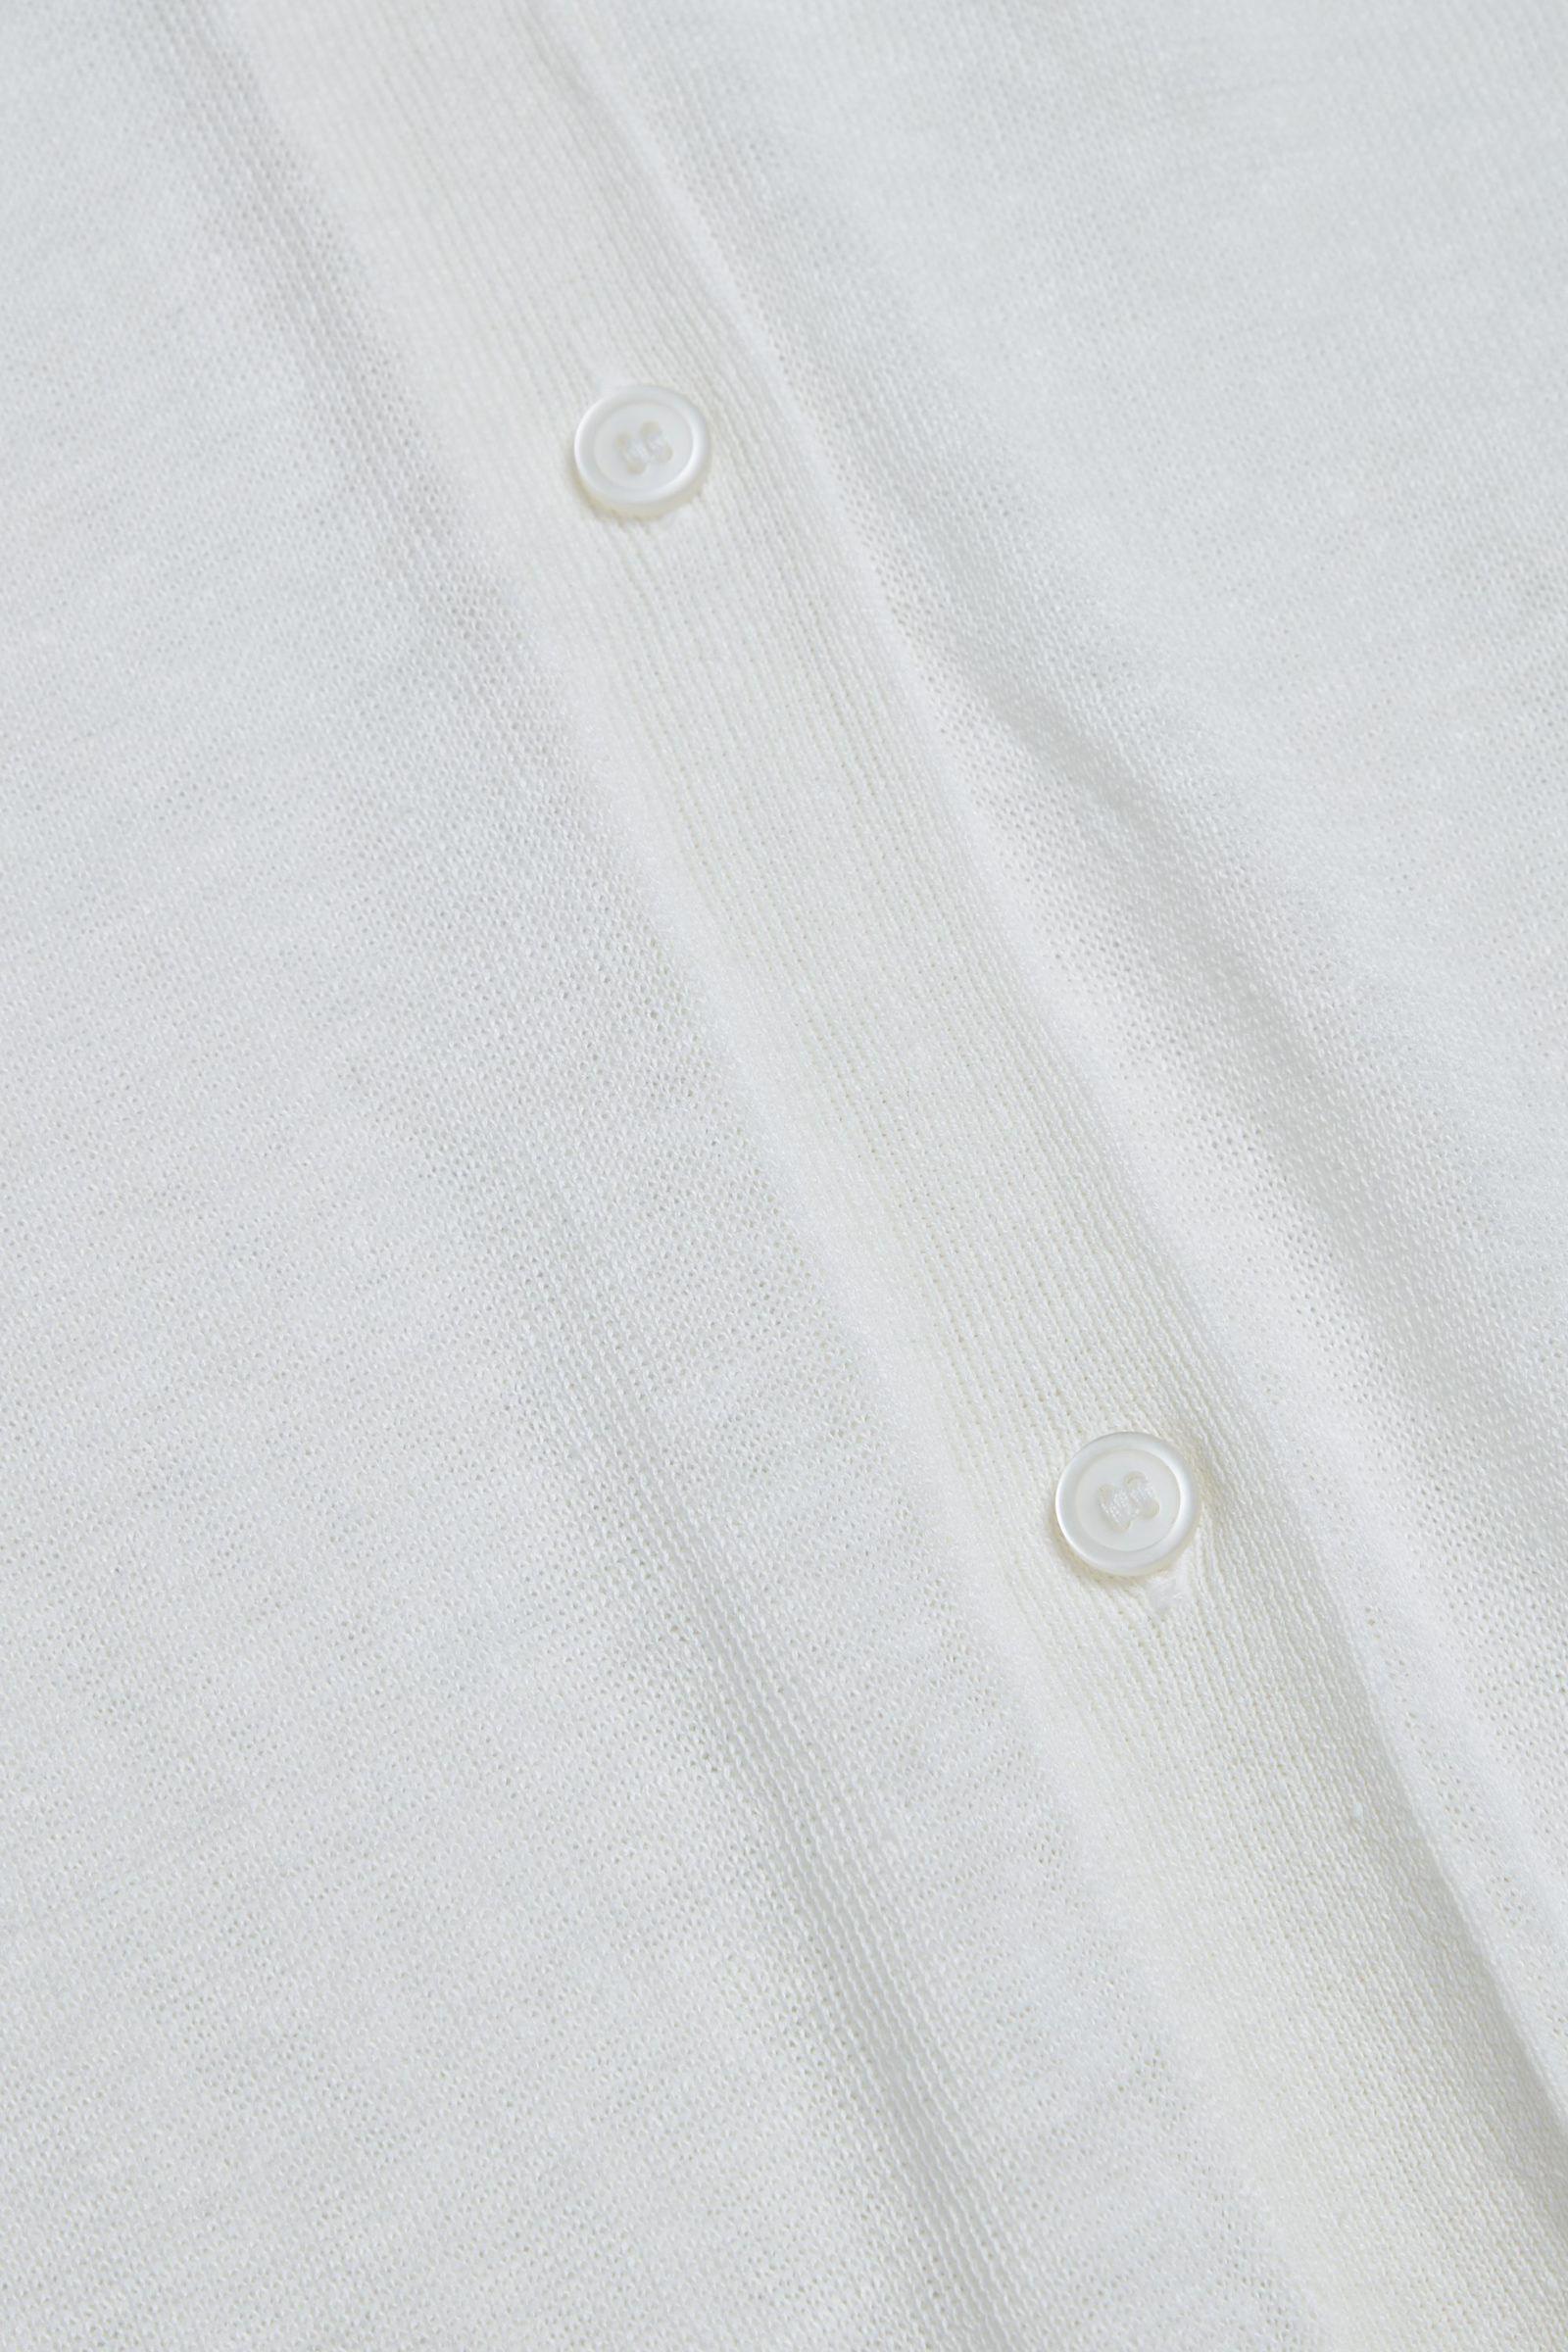 COS 롱 리넨 실크 가디건의 화이트컬러 Detail입니다.